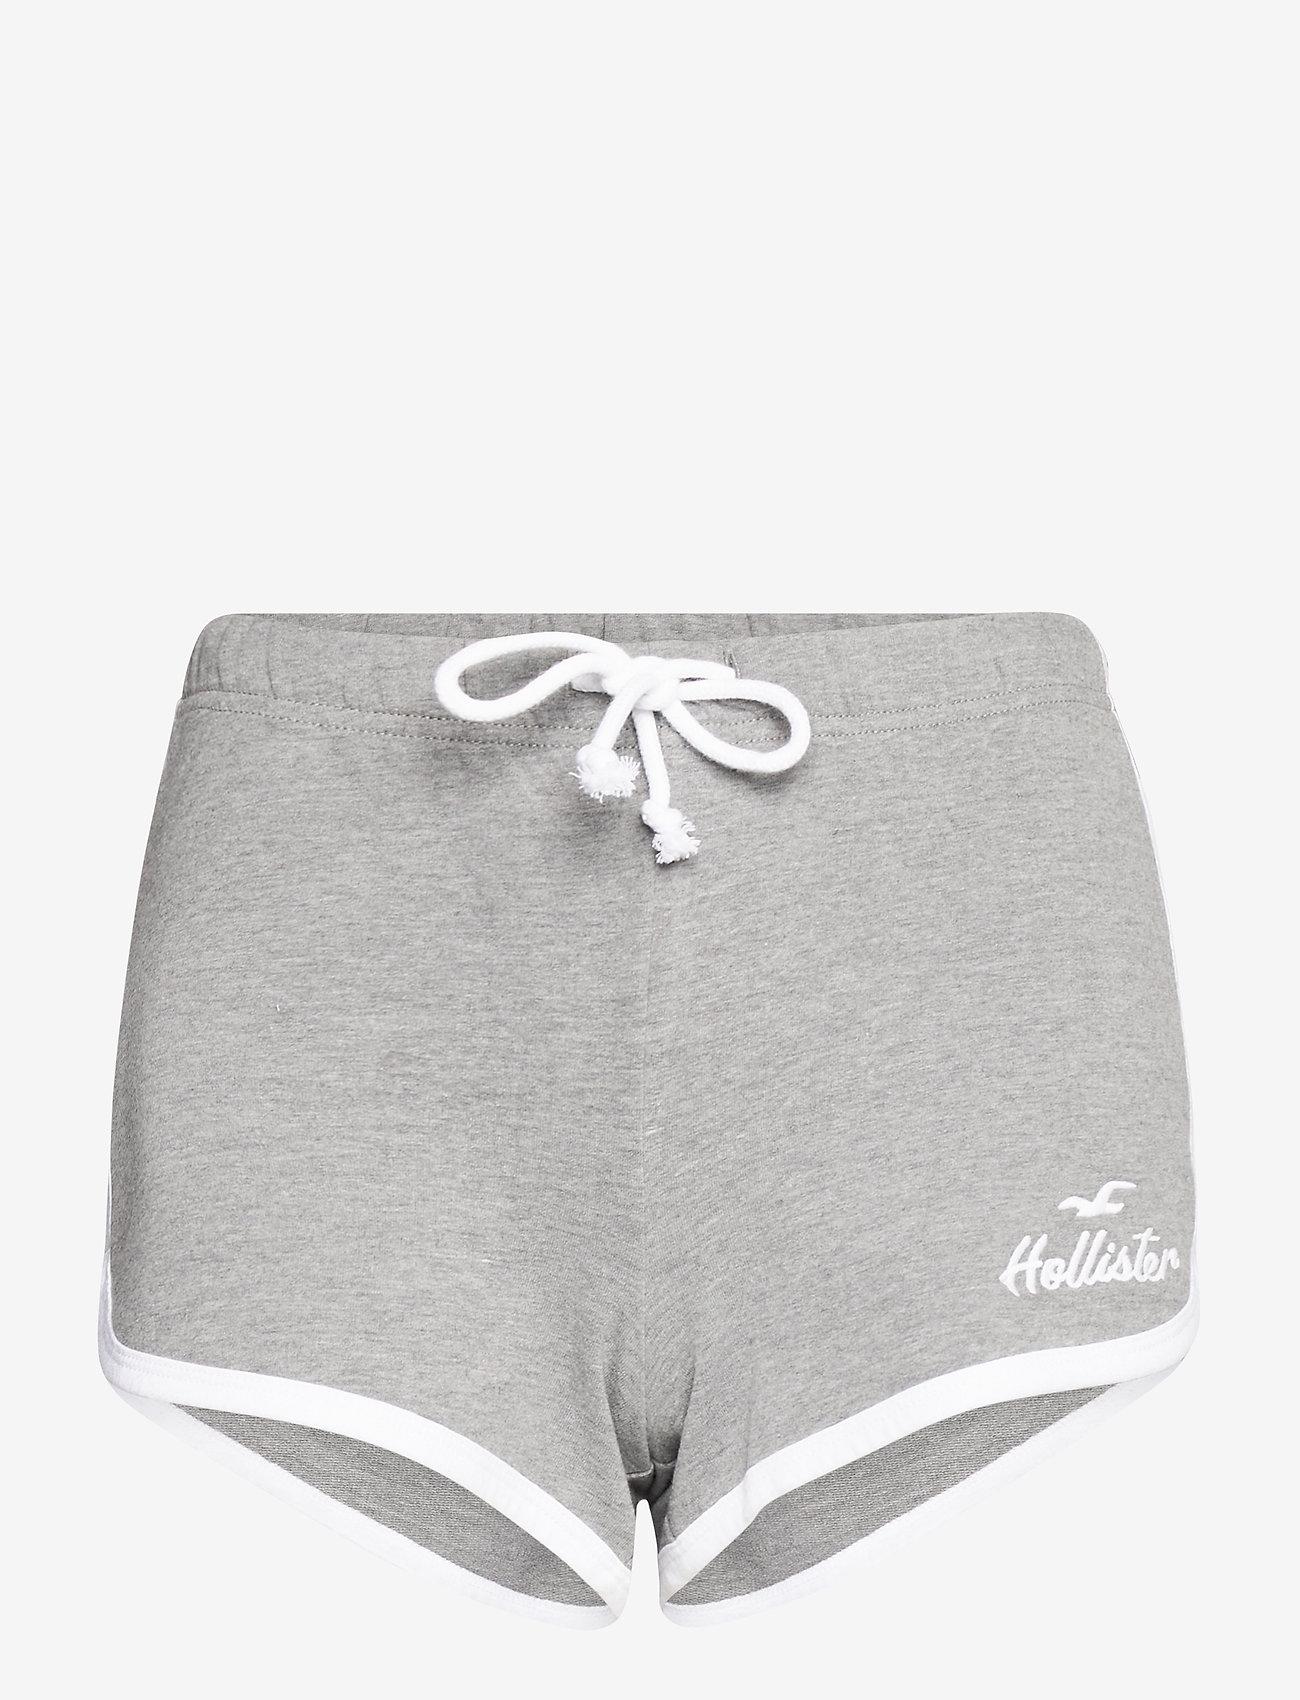 Hollister - HCo. GIRLS SHORTS - shorts casual - grey - 0